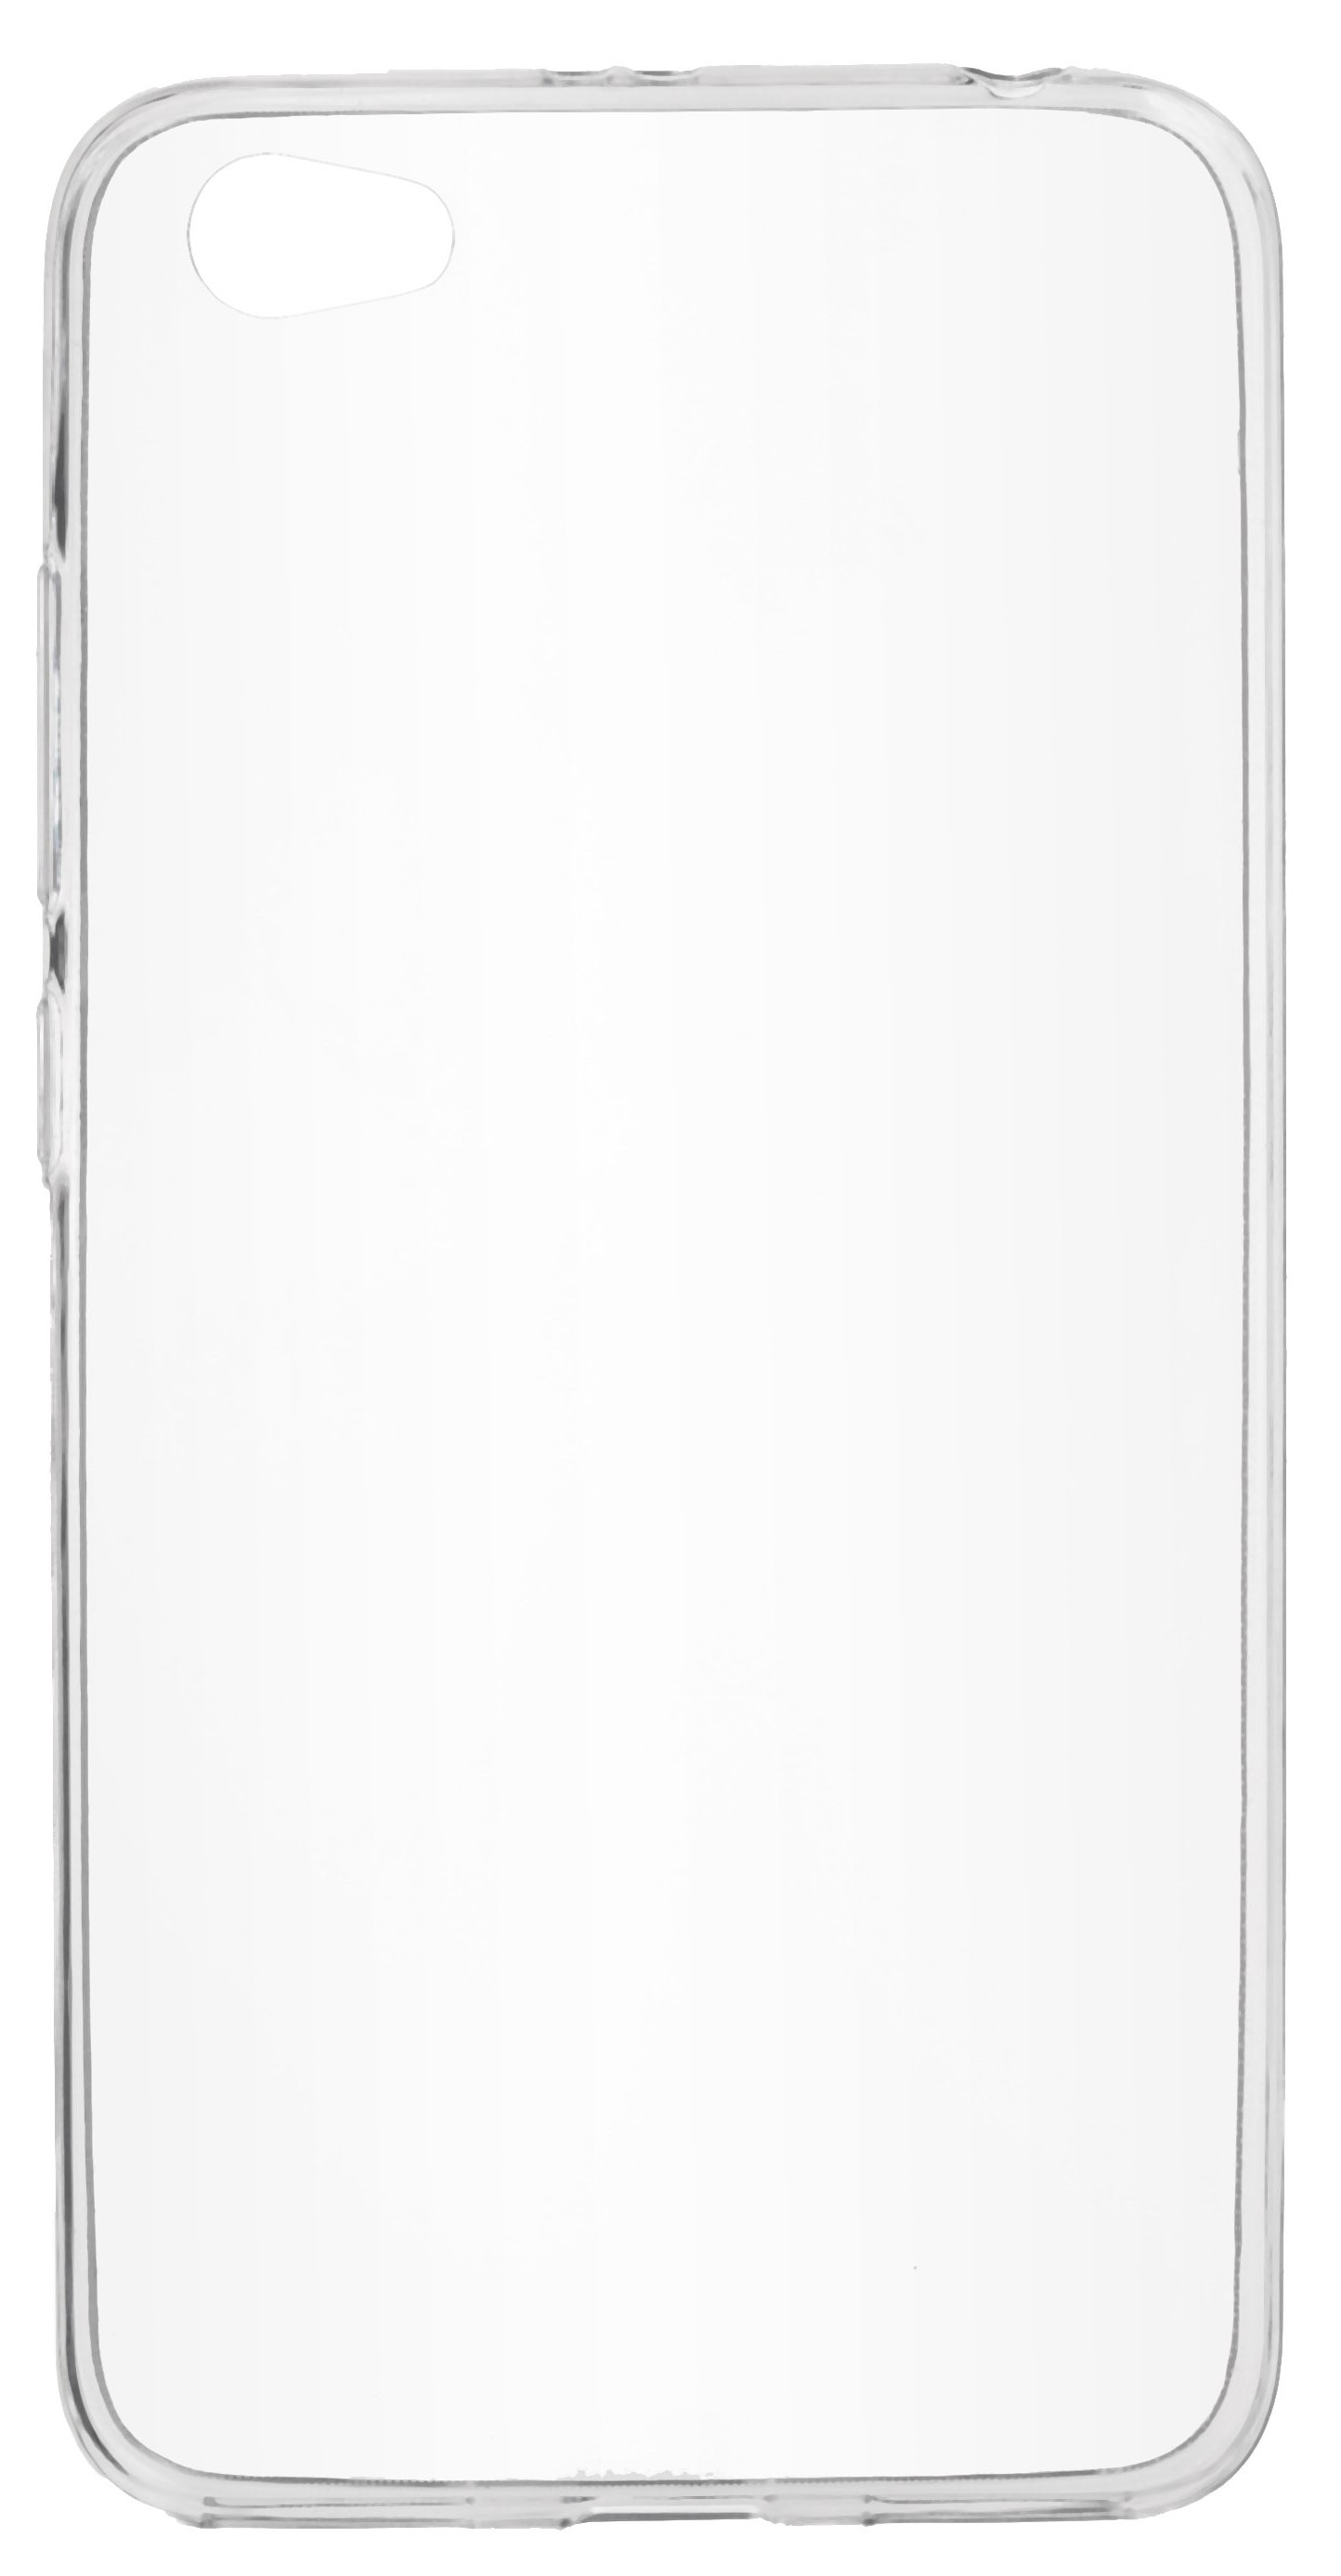 Чехол для сотового телефона skinBOX Slim Silicone, 4660041409383, прозрачный цена и фото